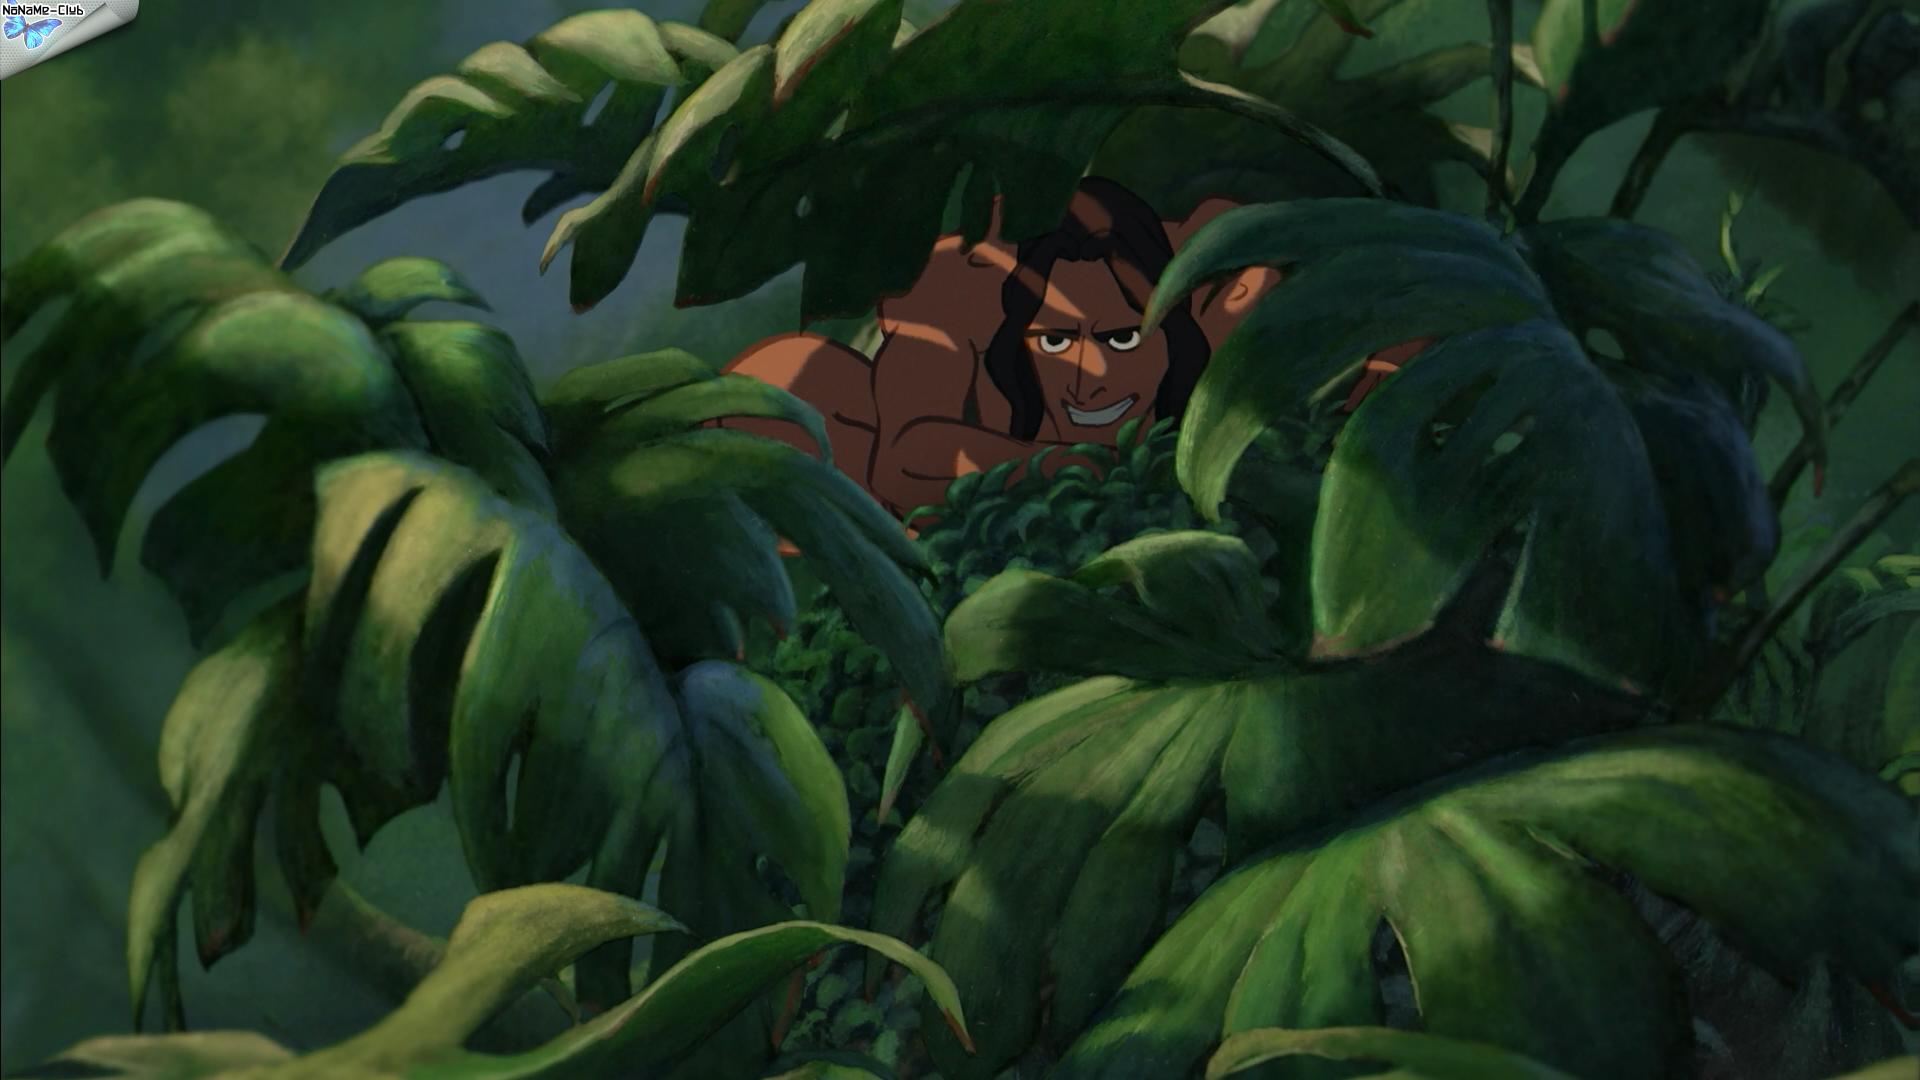 [BD] Tarzan (6 juin 2012) - Page 3 1052fdf8d97f